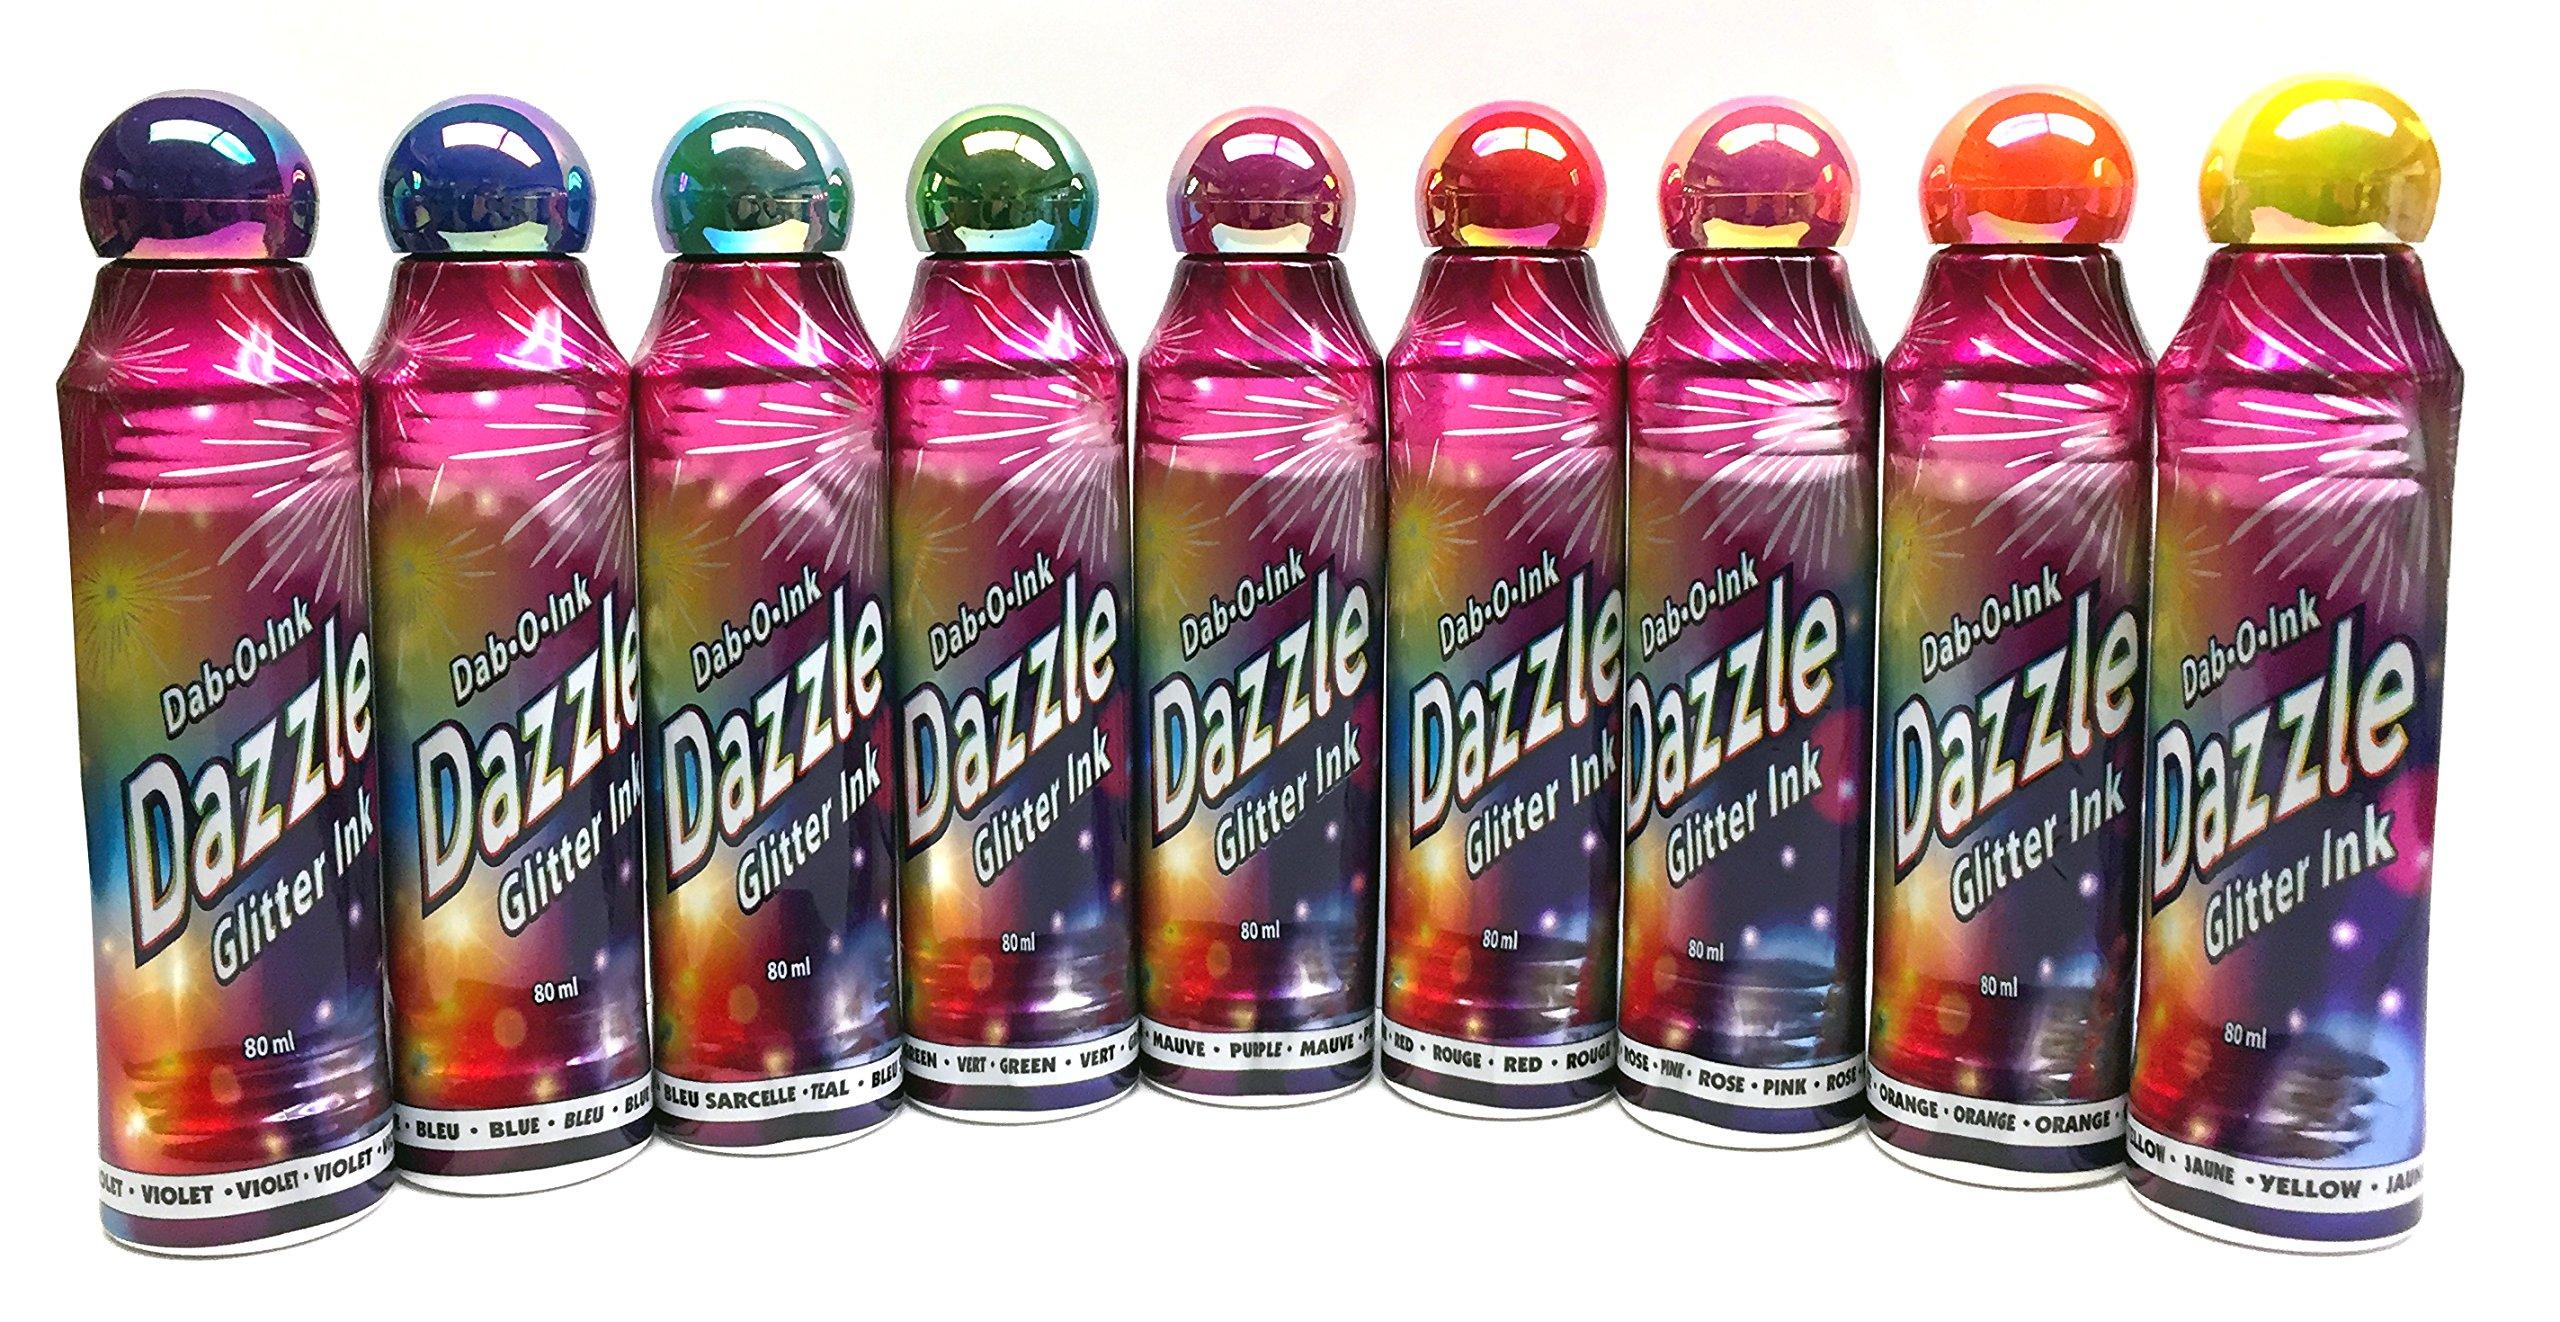 Dazzle Glitter Bingo Dauber Ink 12-Pack - Mixed Colors